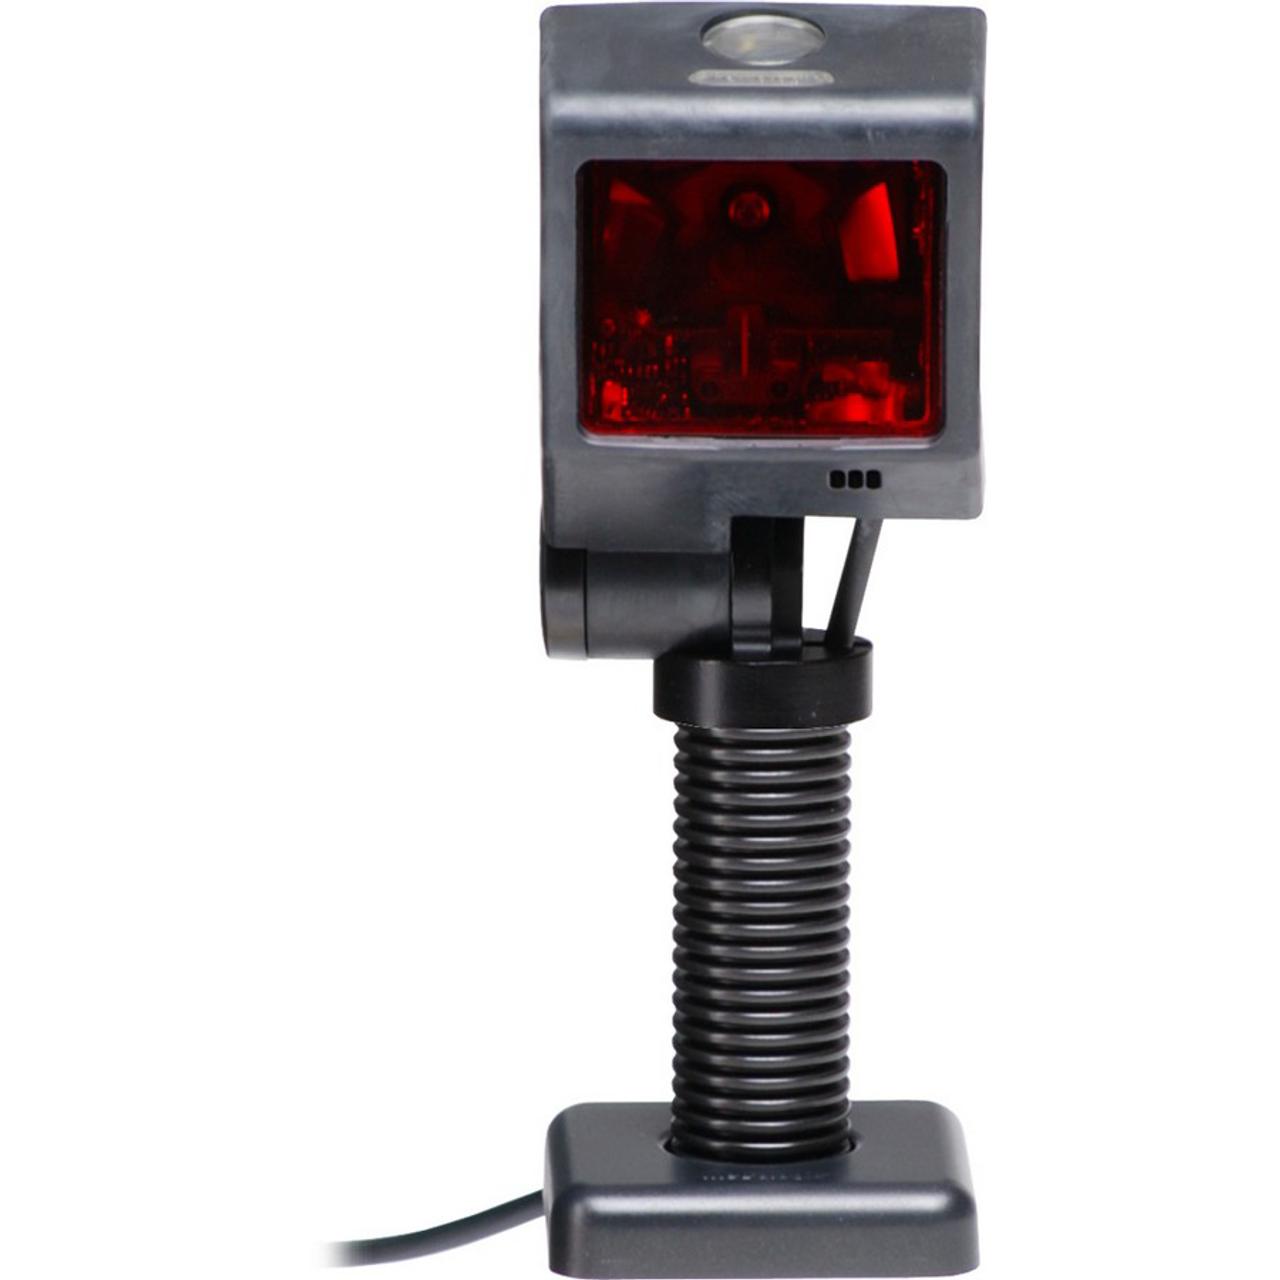 RS232 Honeywell Scanning MK3580-31B41 MS3580 QUANTUM T BLACK POWER S SCANNER